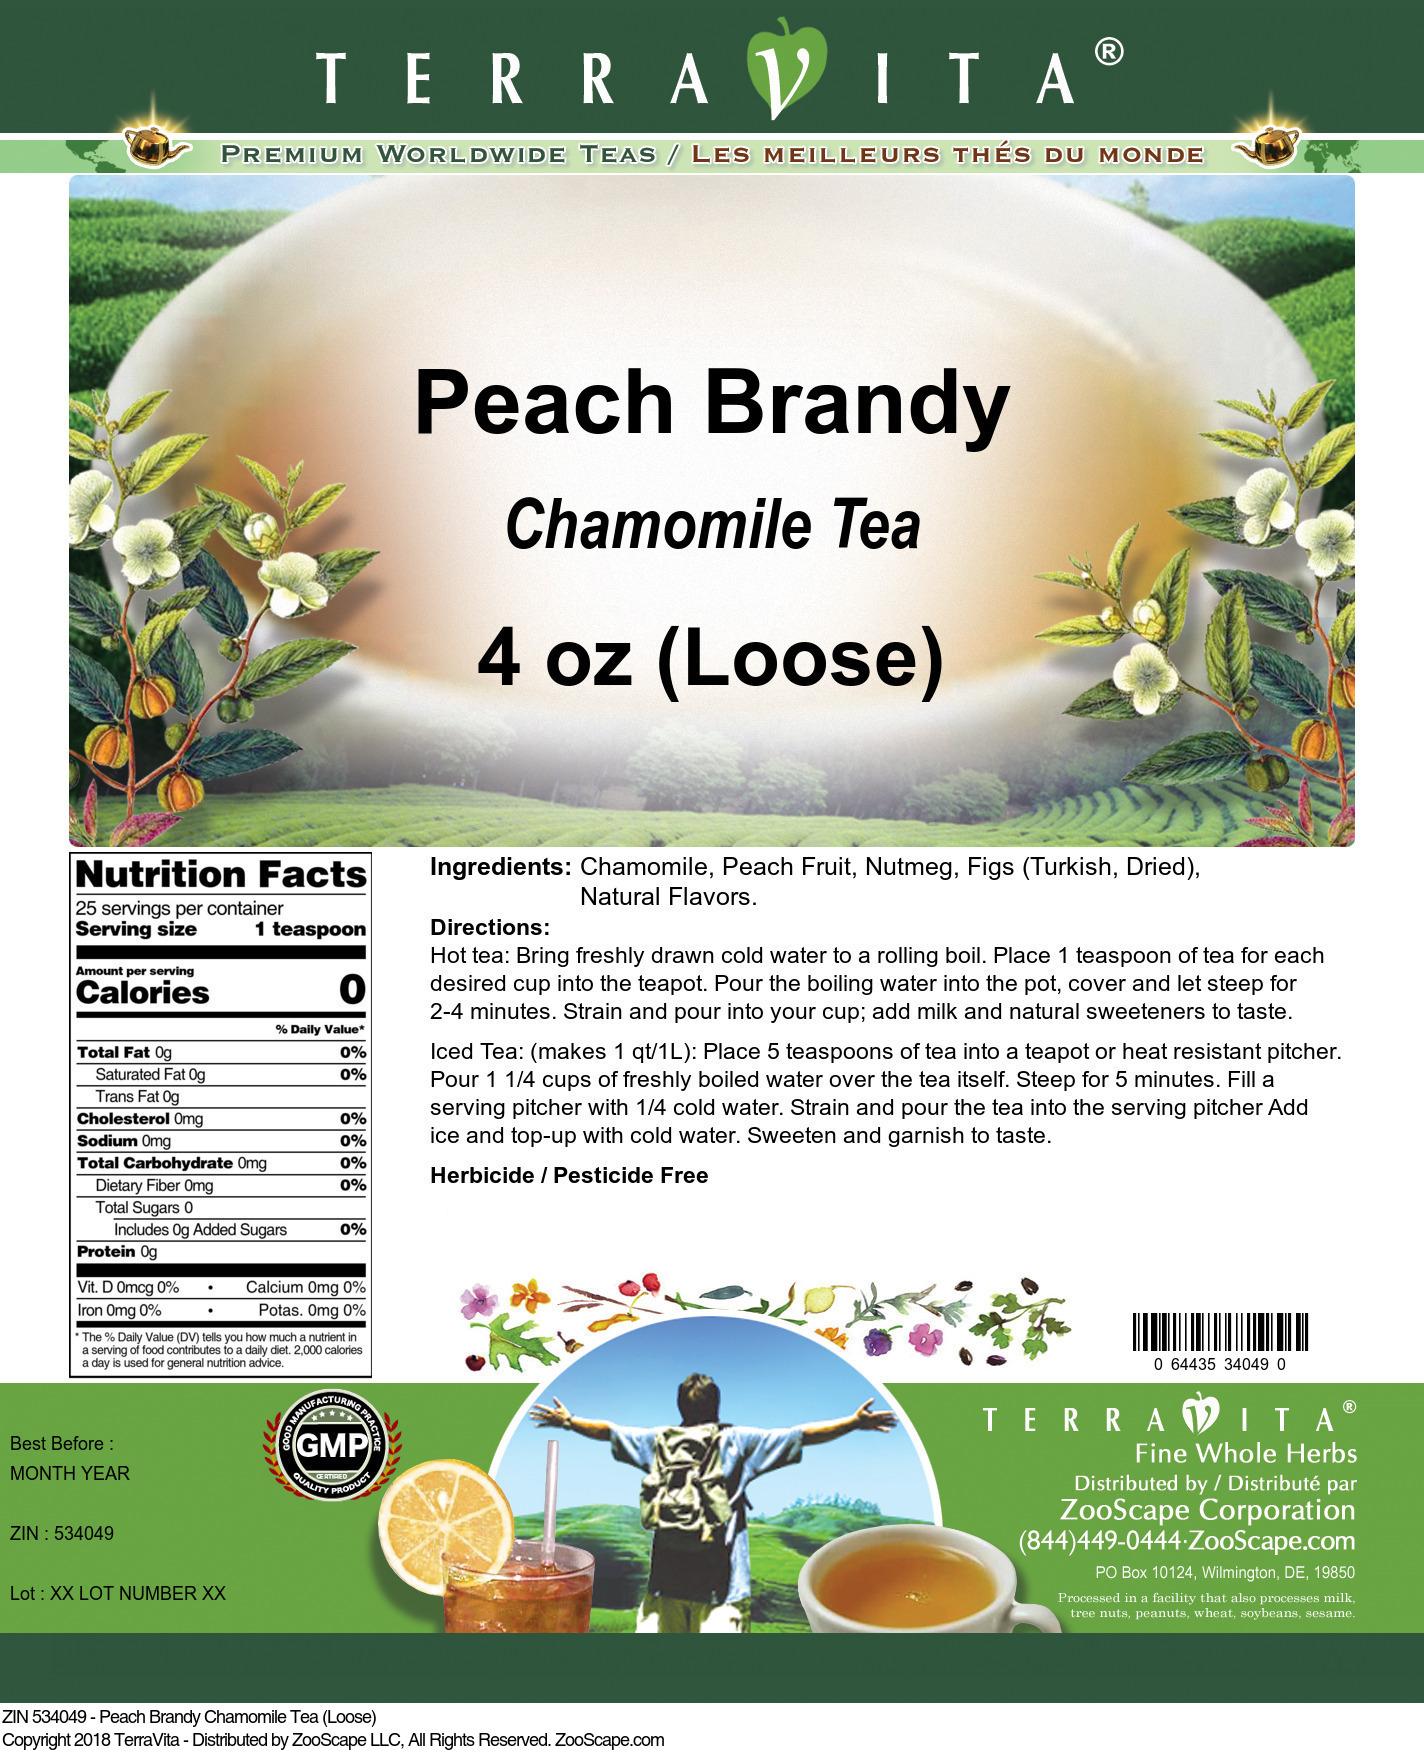 Peach Brandy Chamomile Tea (Loose)